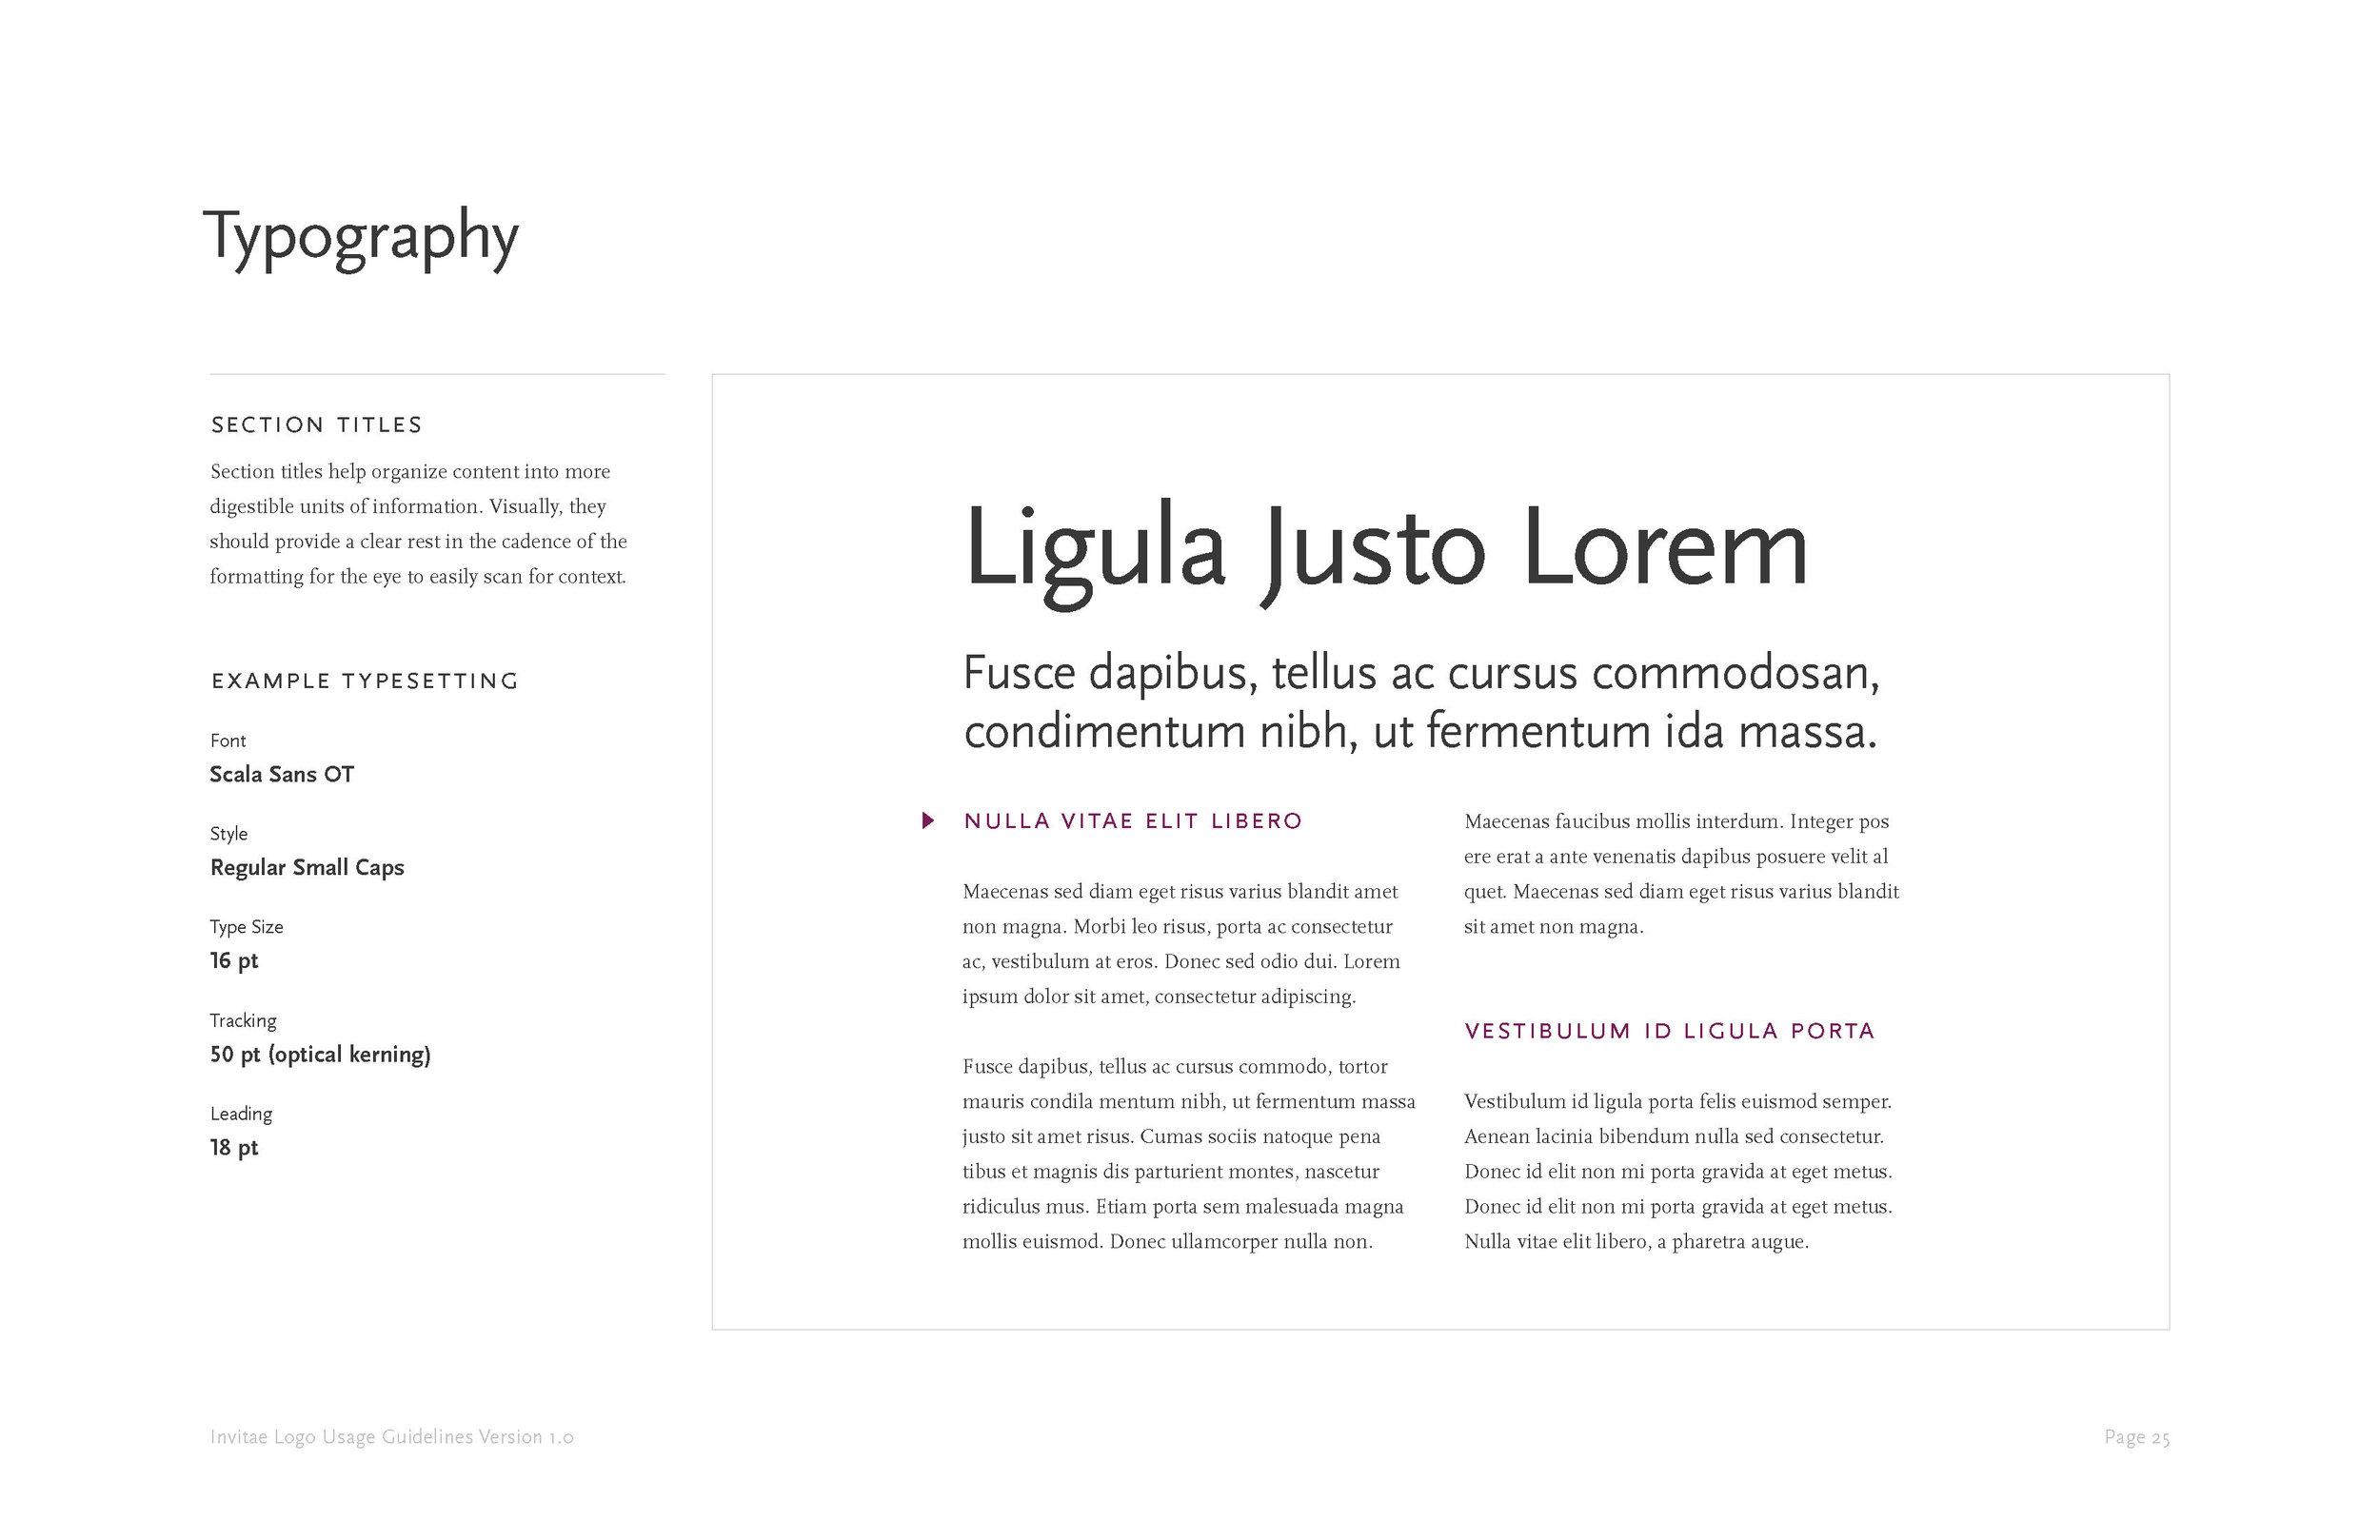 Invitae_logo_guidelines_Page_27.jpg